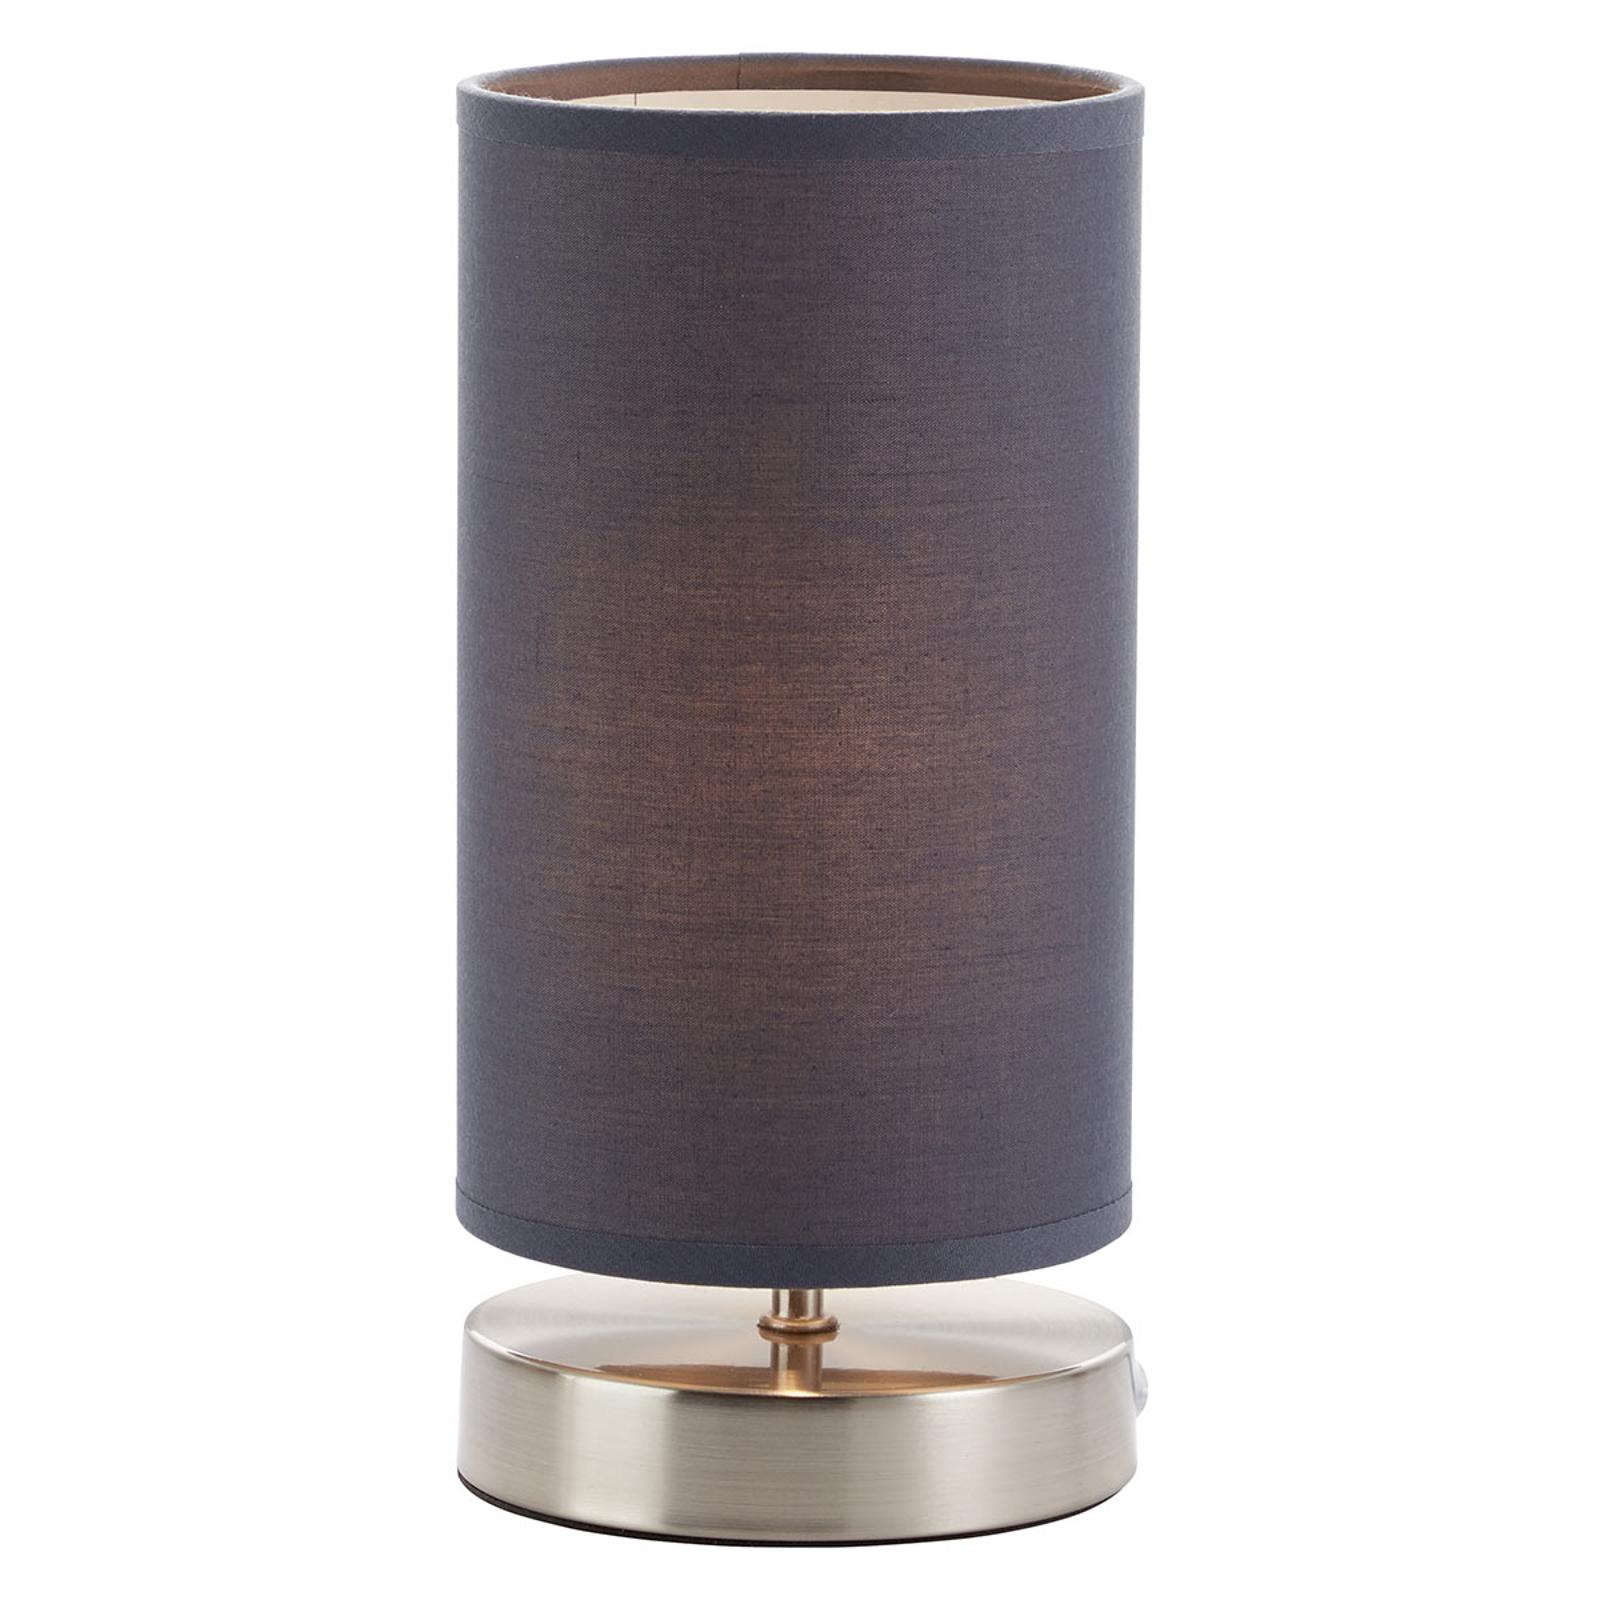 Bordlampe Clarie med grå stoffskjerm